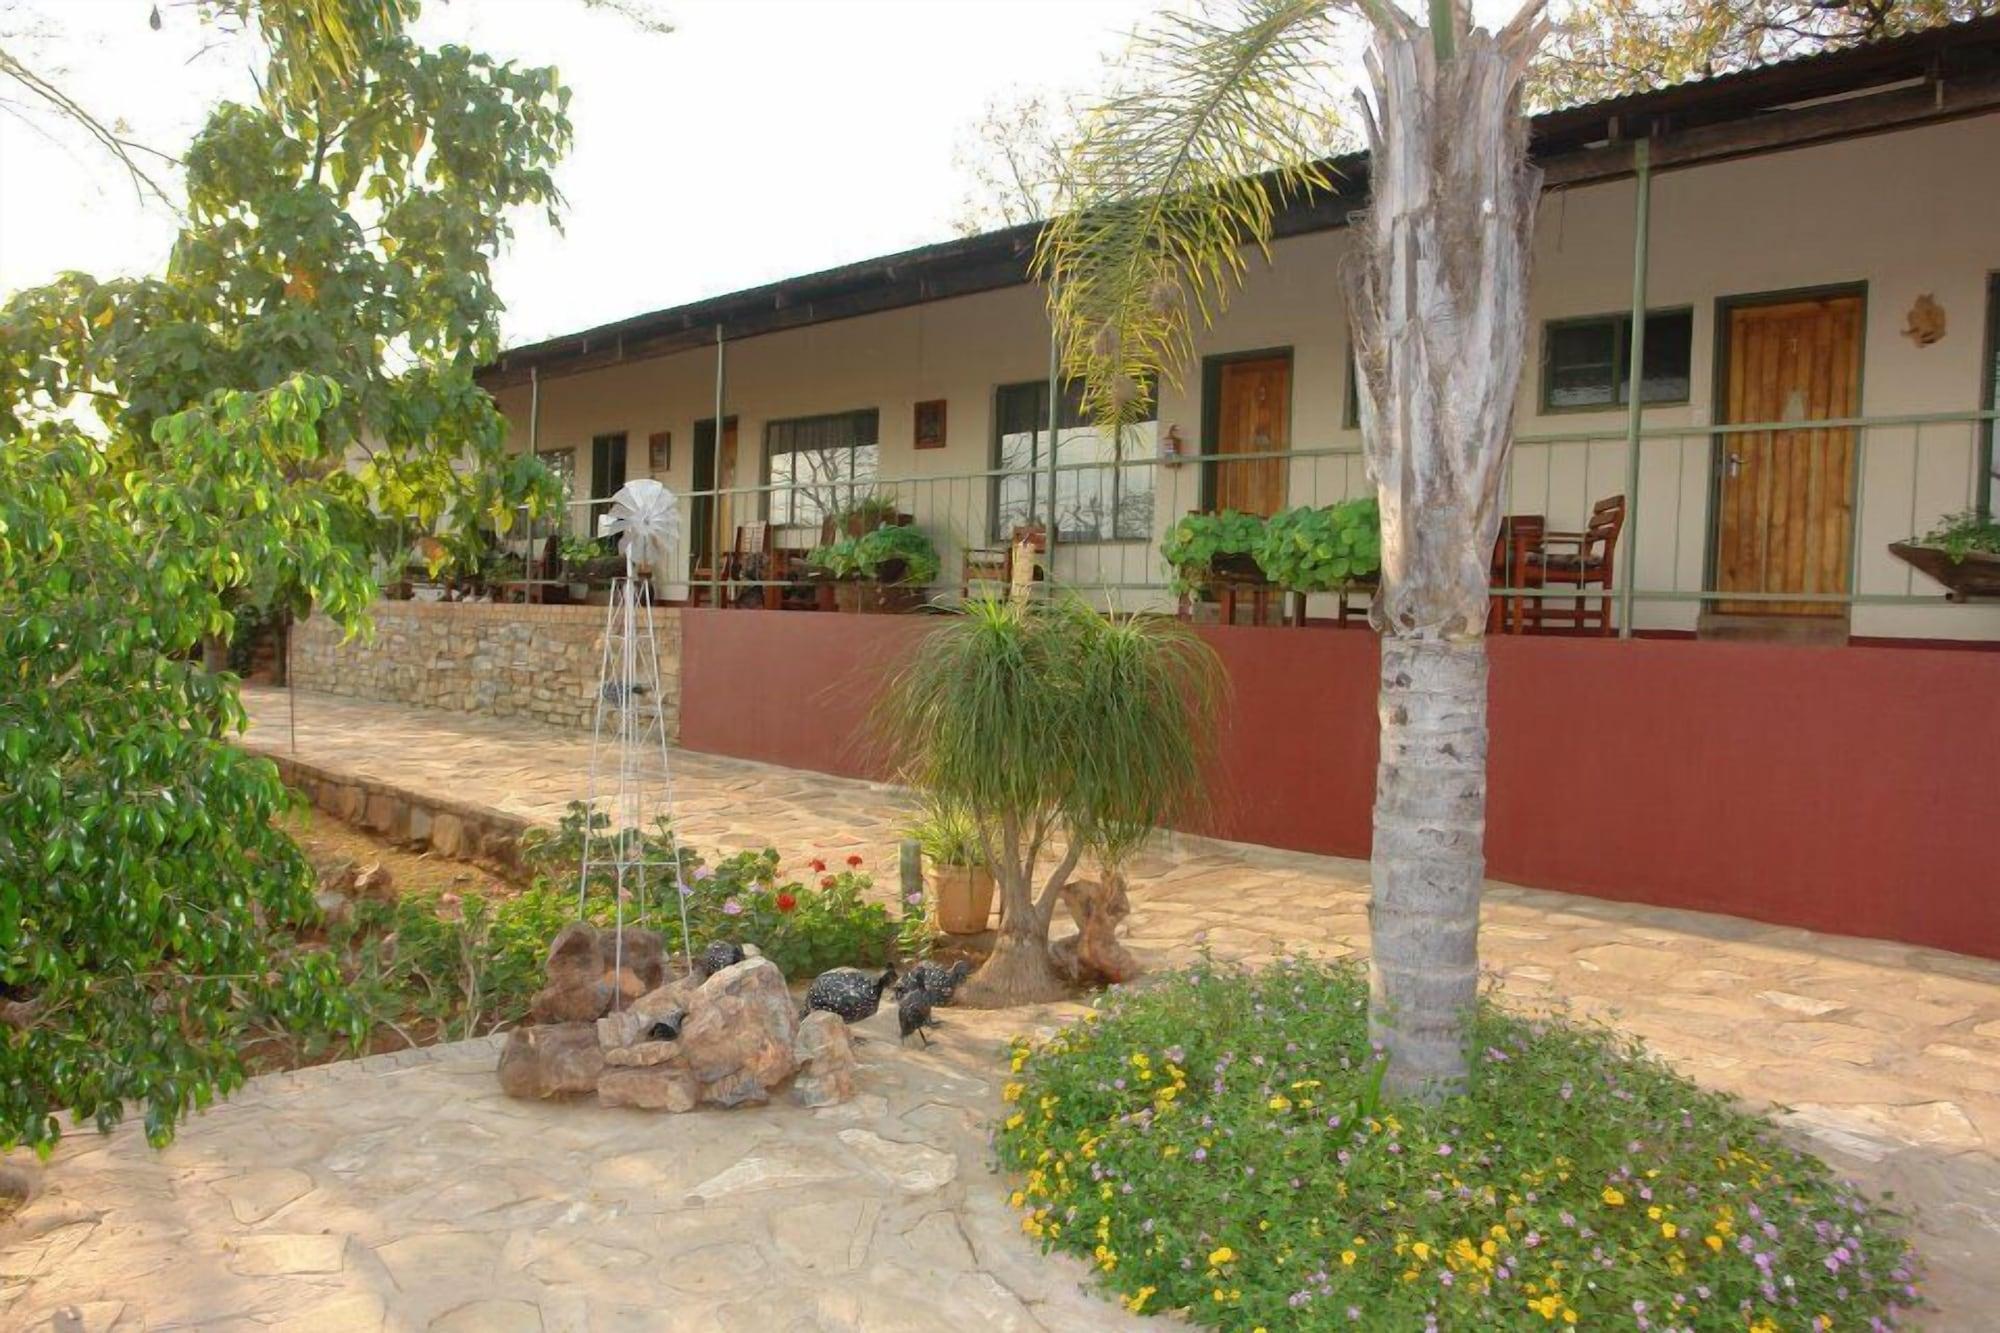 Toko Kamanjab Lodge & Safari, Kamanjab